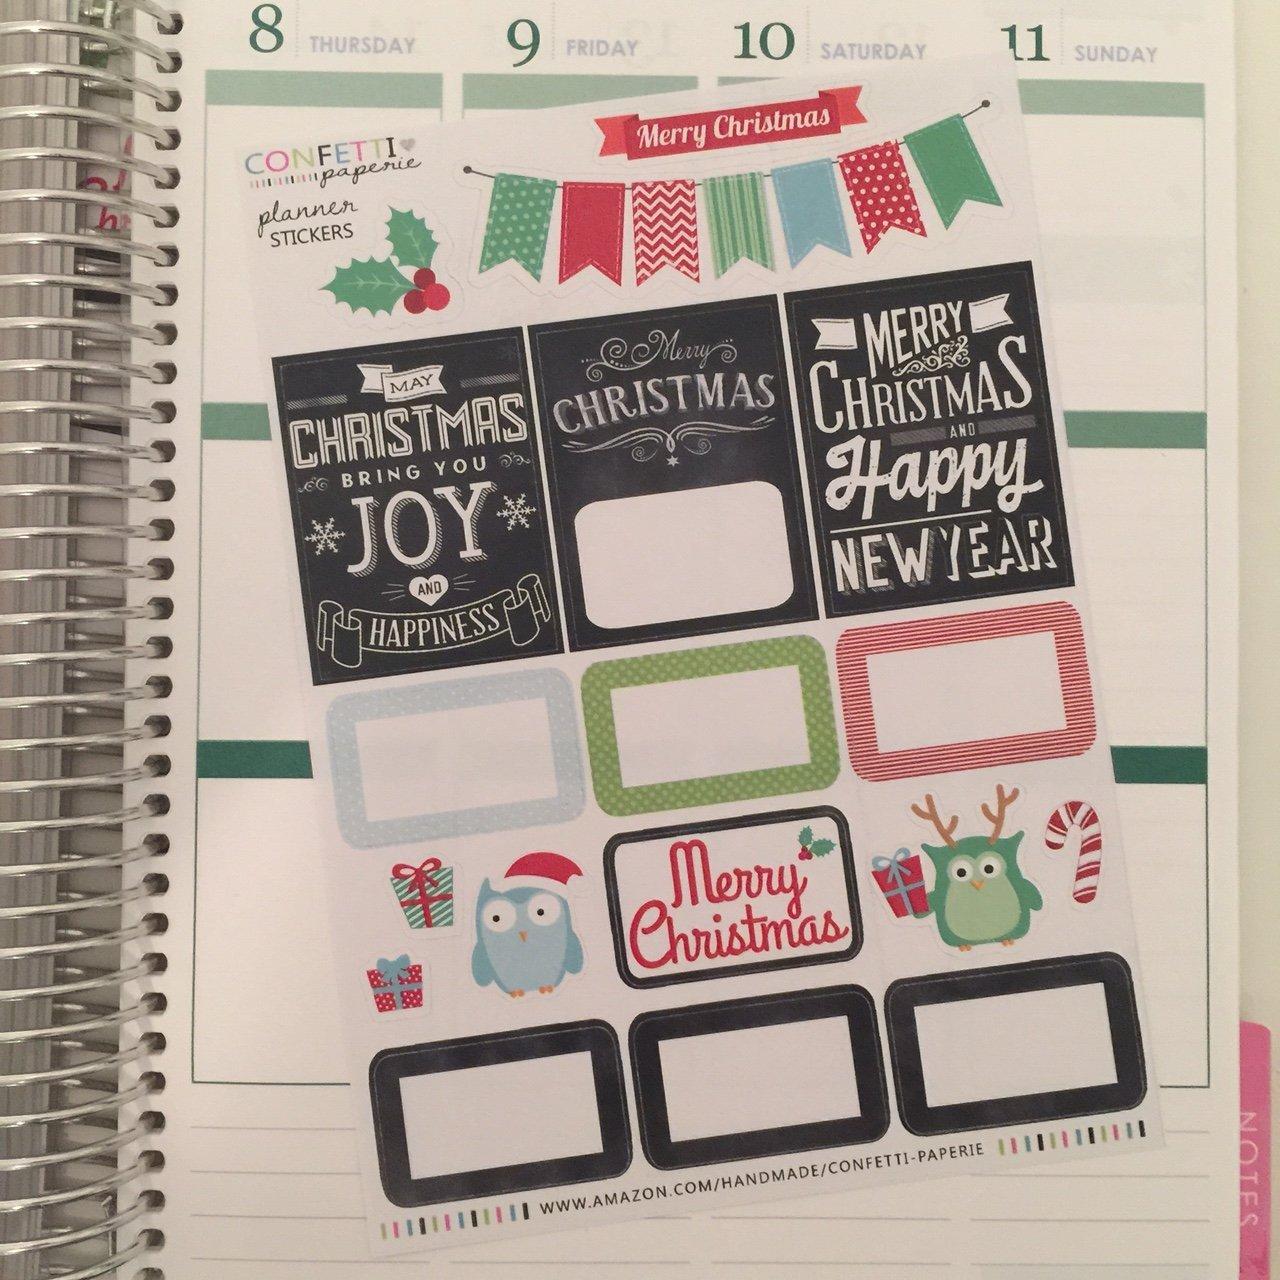 Amazon.com: CHALK Christmas Planner Stickers | Vintage ...